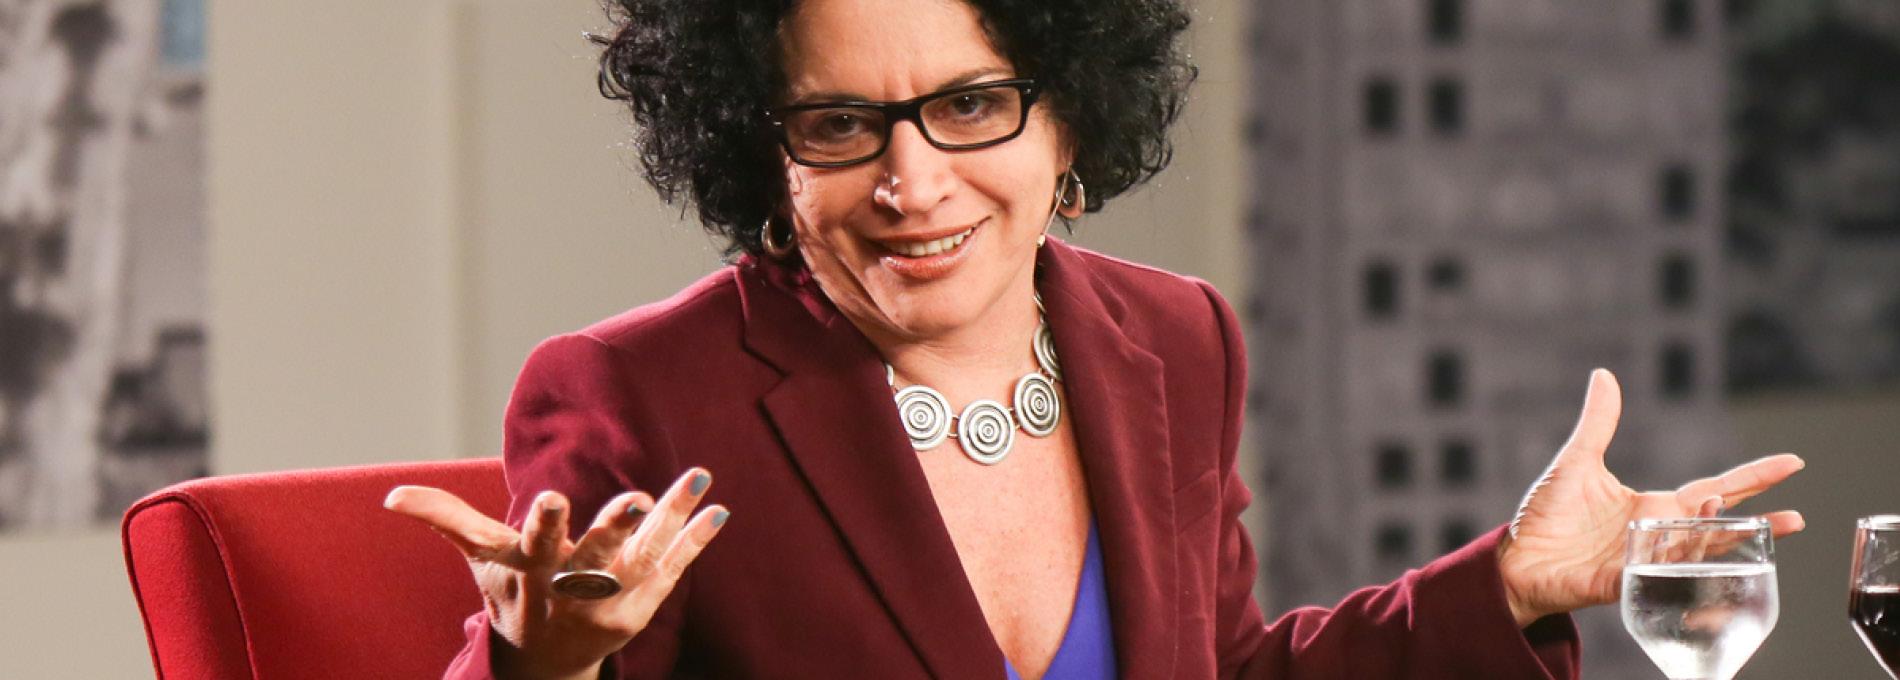 A filósofa Viviane Mosé imagina o futuro pós-covid19